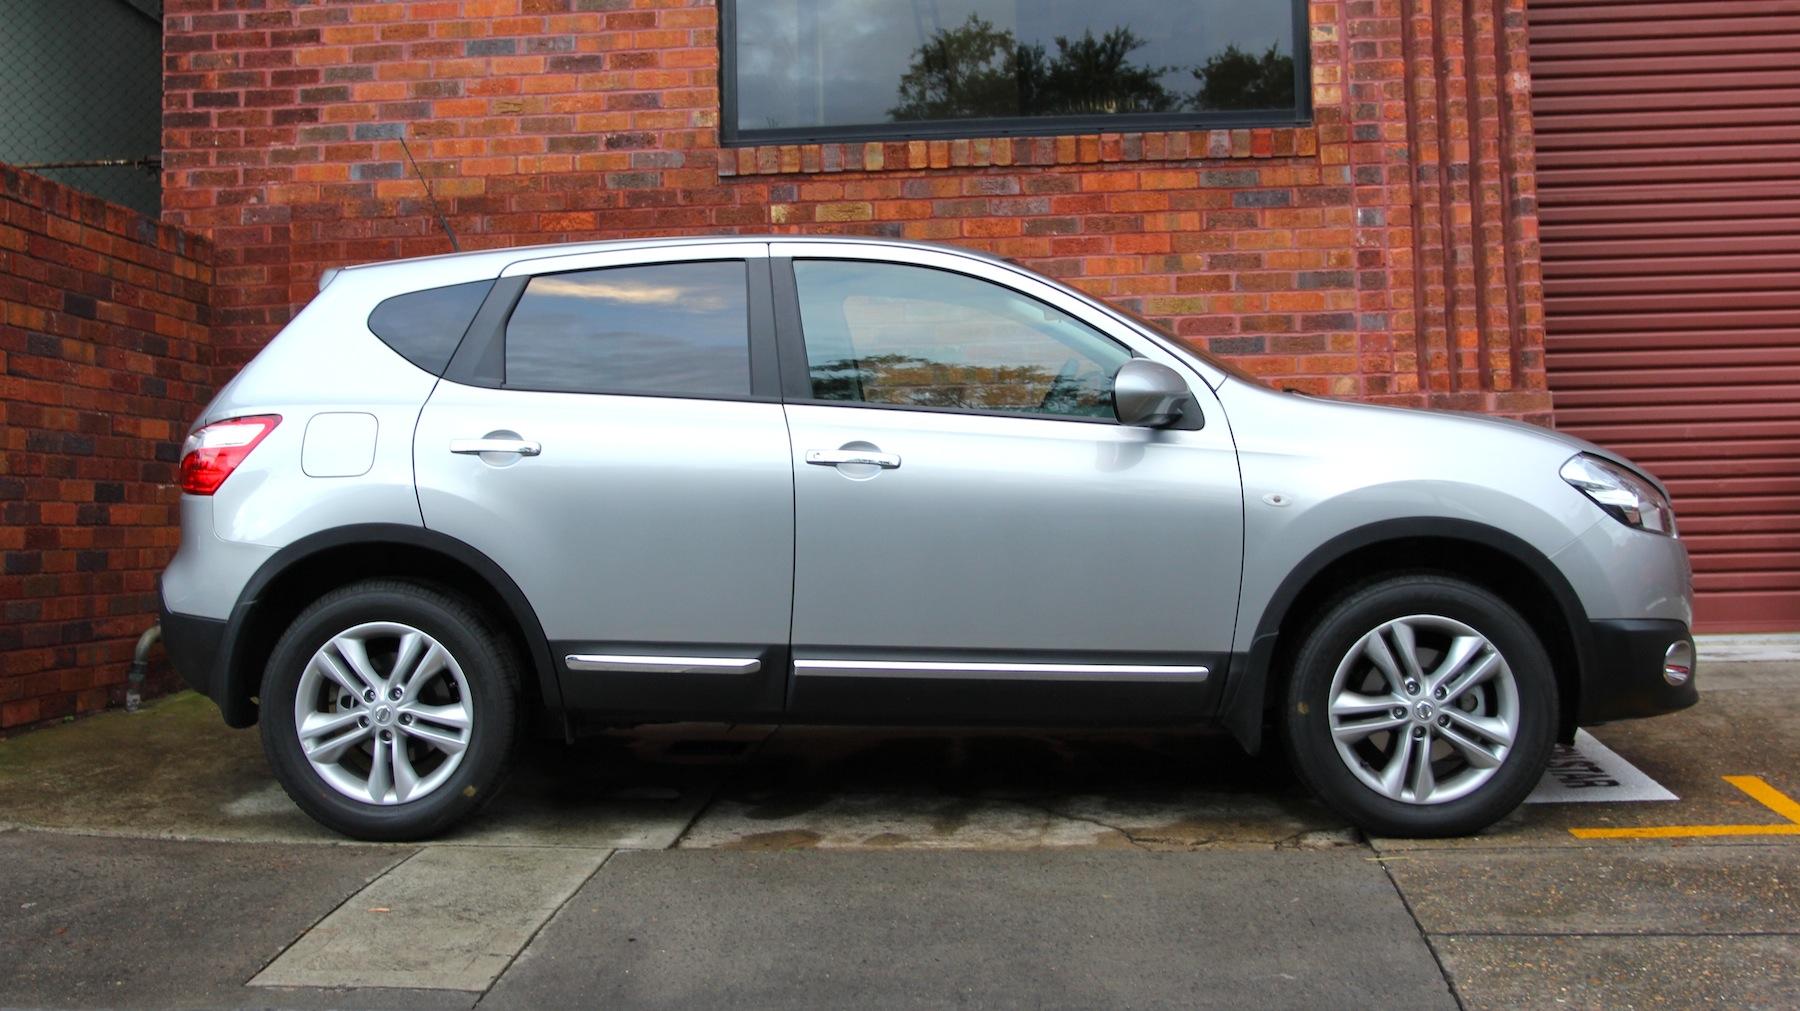 Nissan Dualis Ts Review Caradvice | Upcomingcarshq.com